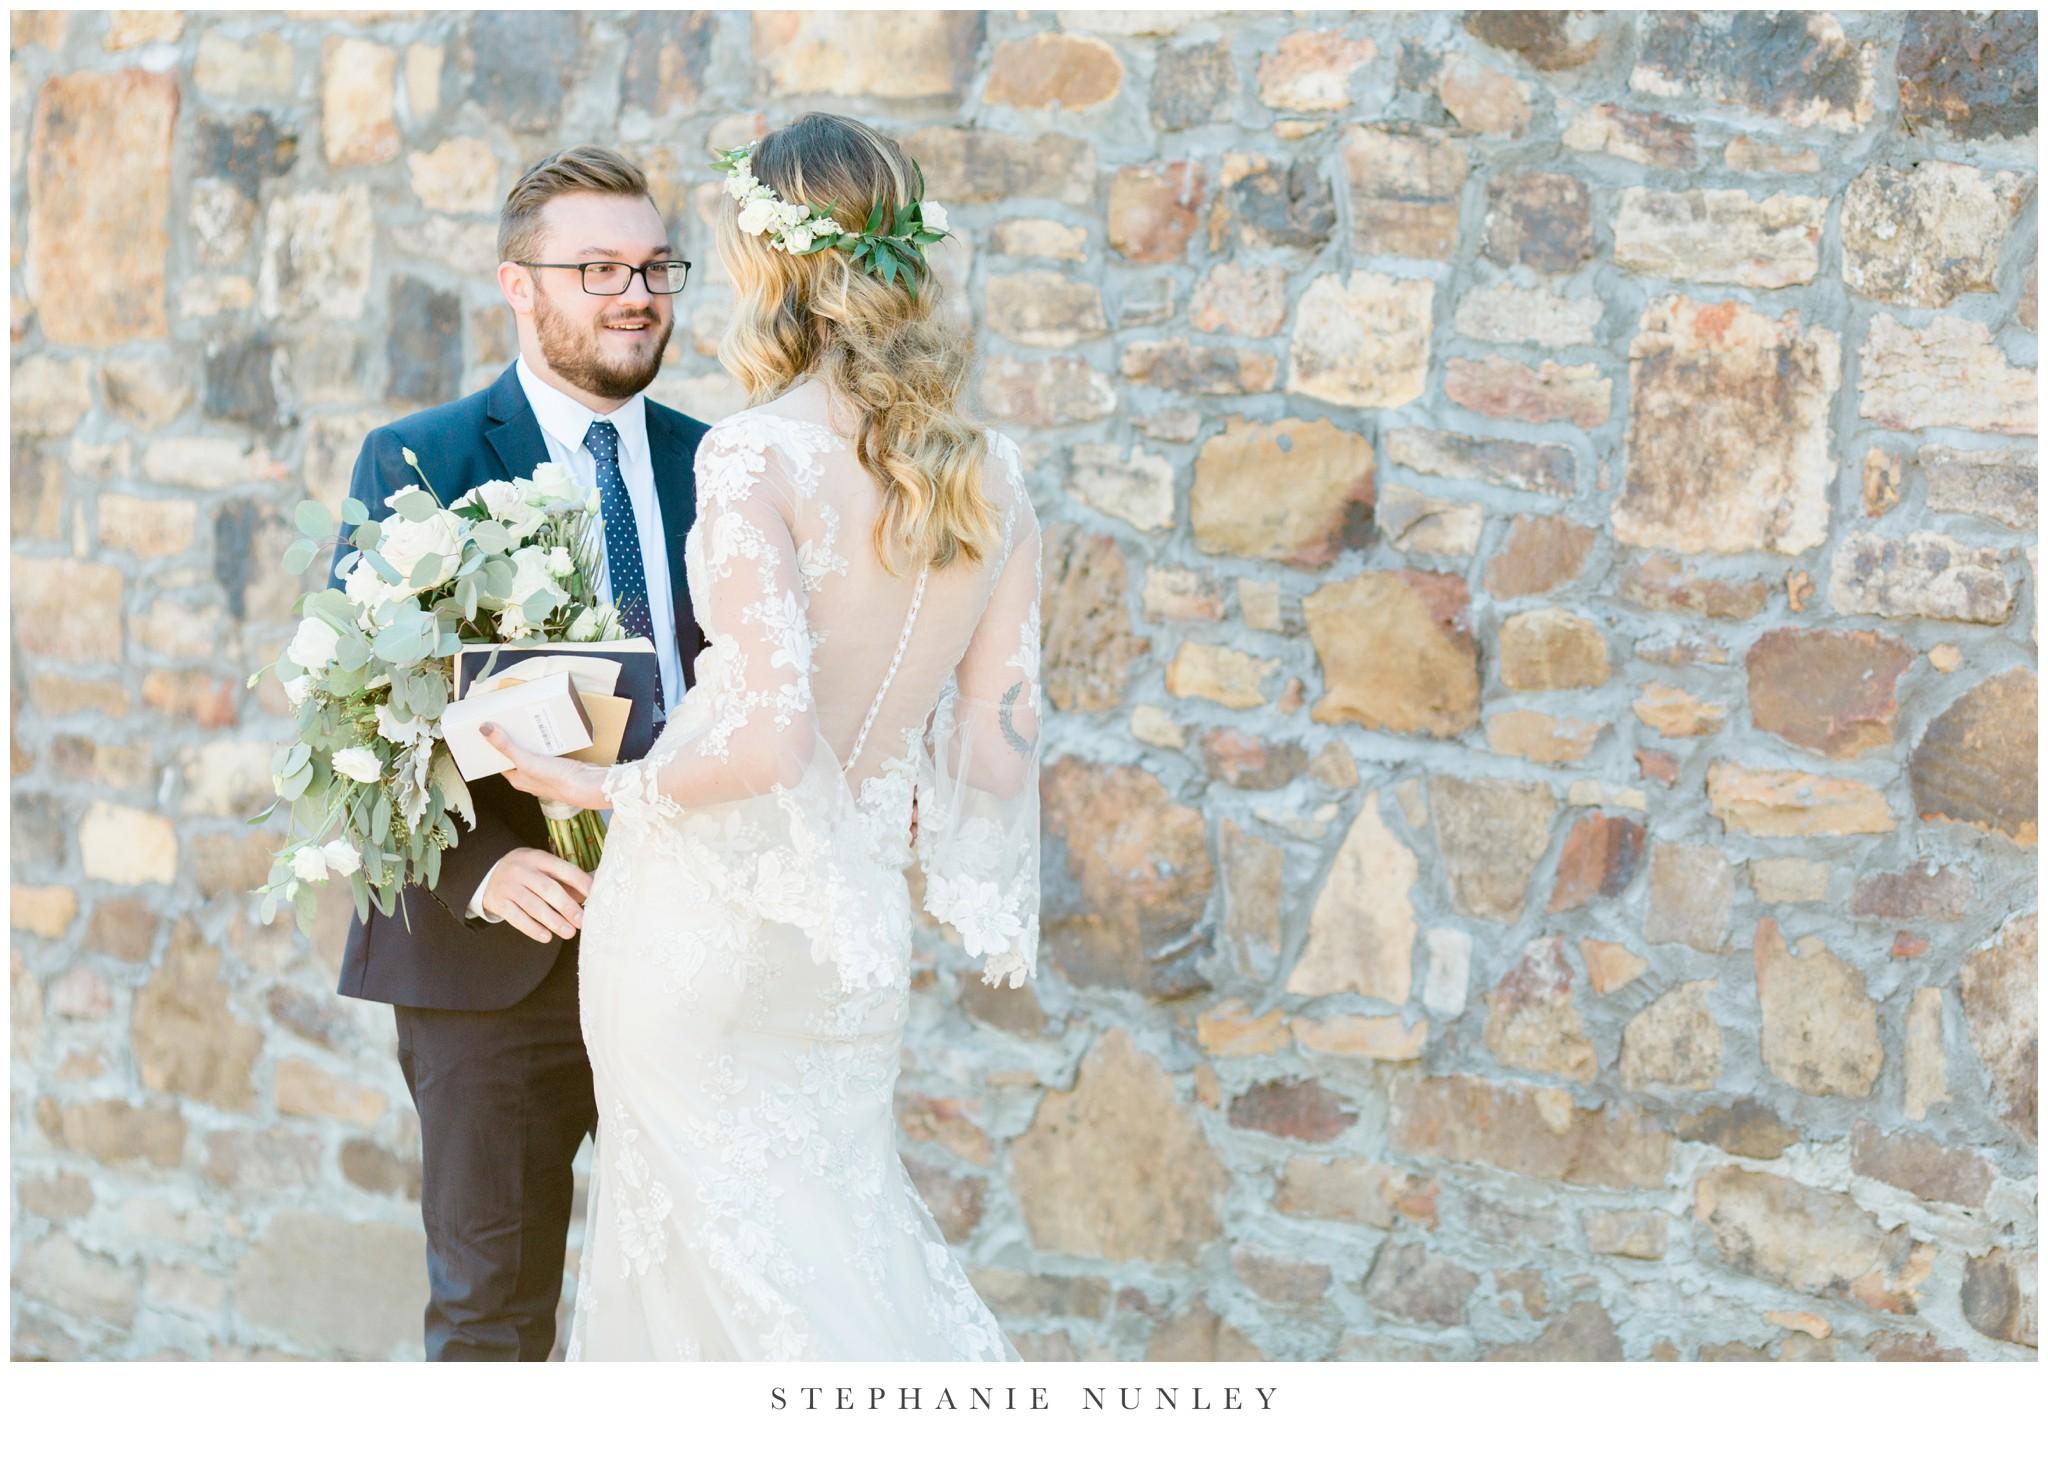 sassafrass-springs-vineyard-film-wedding-photos-26.jpg